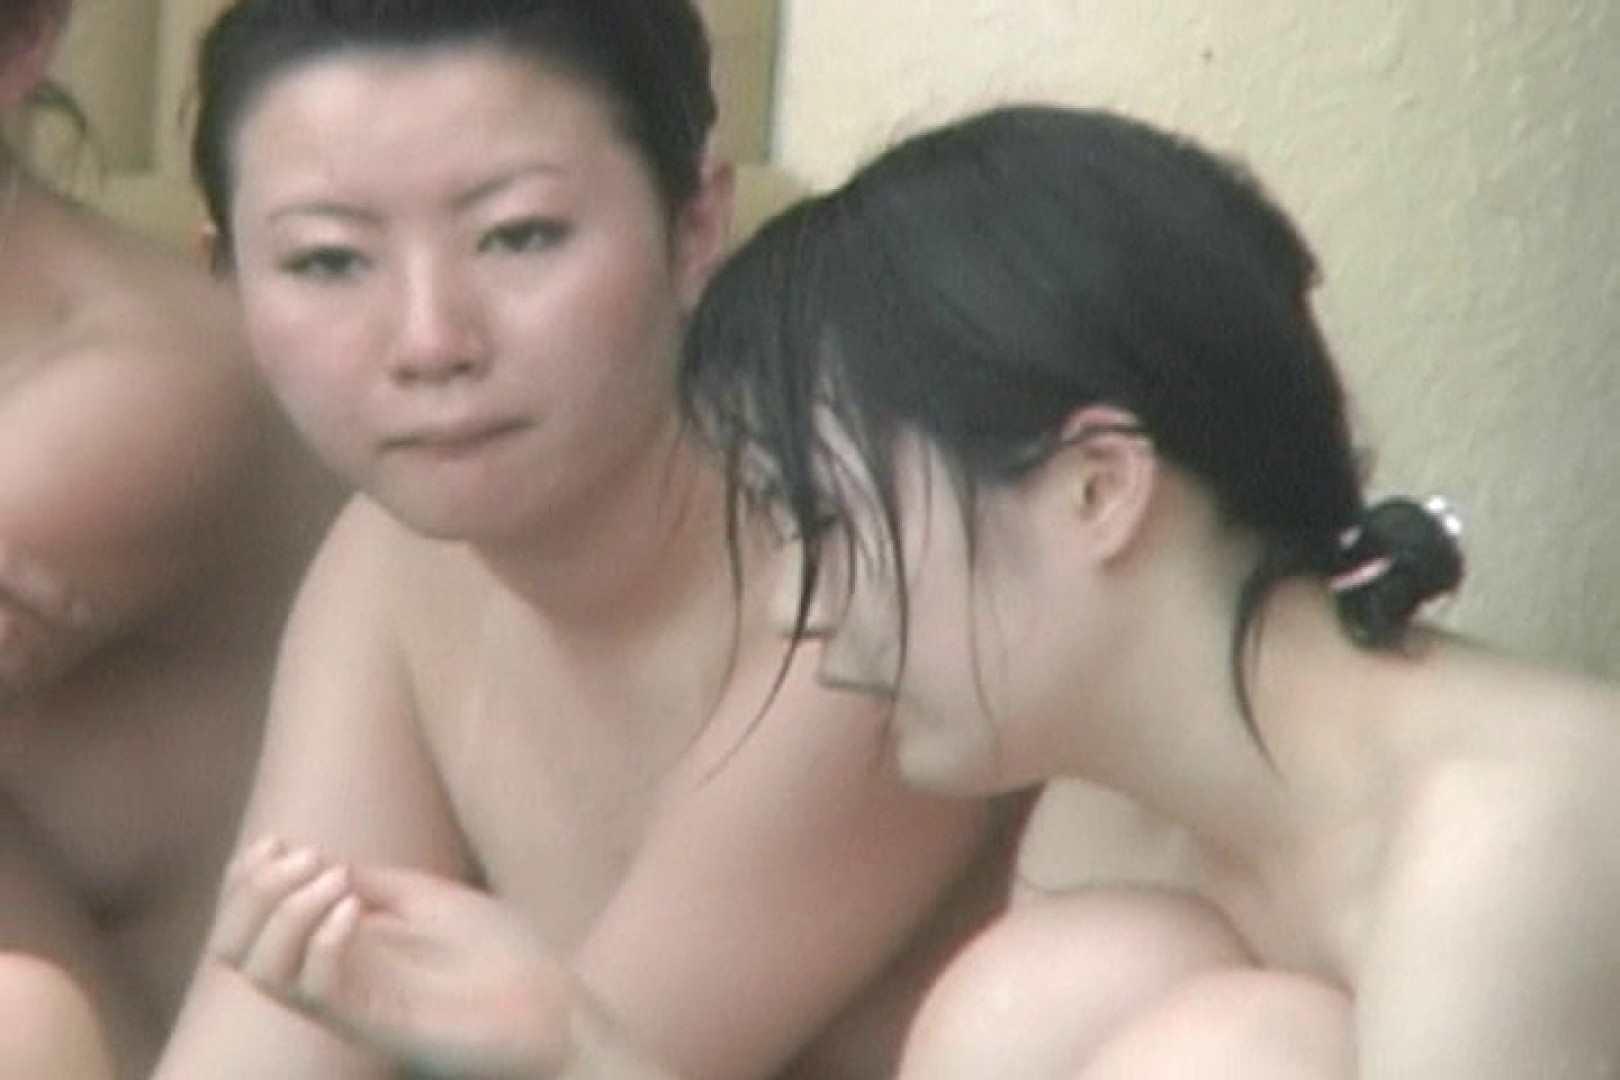 Aquaな露天風呂Vol.593 HなOL   盗撮  91pic 53